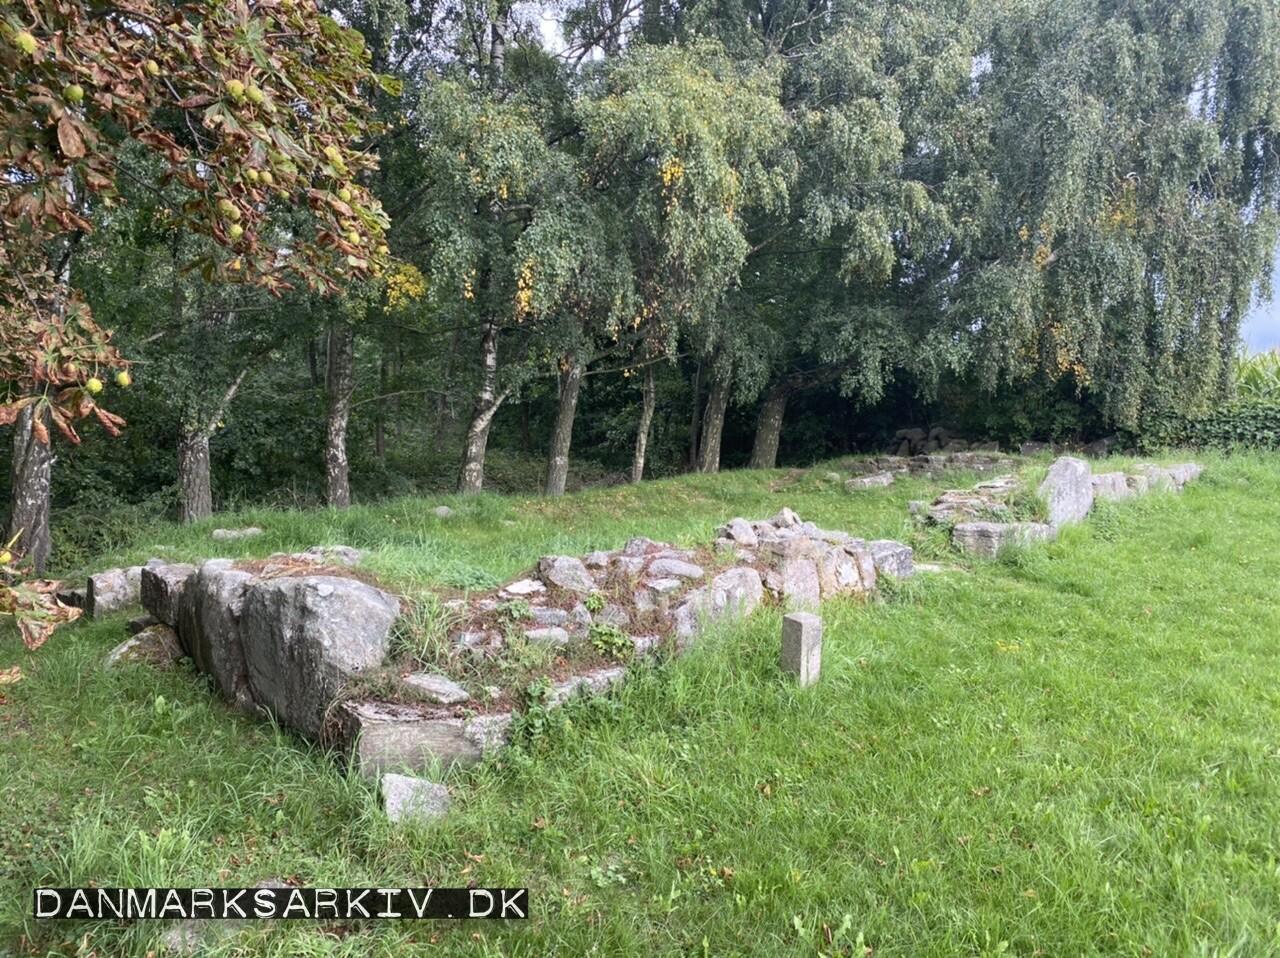 Kapel ruinen ved Sankt Jørgensgården Spidlegård - Aakirkeby, Bornholm